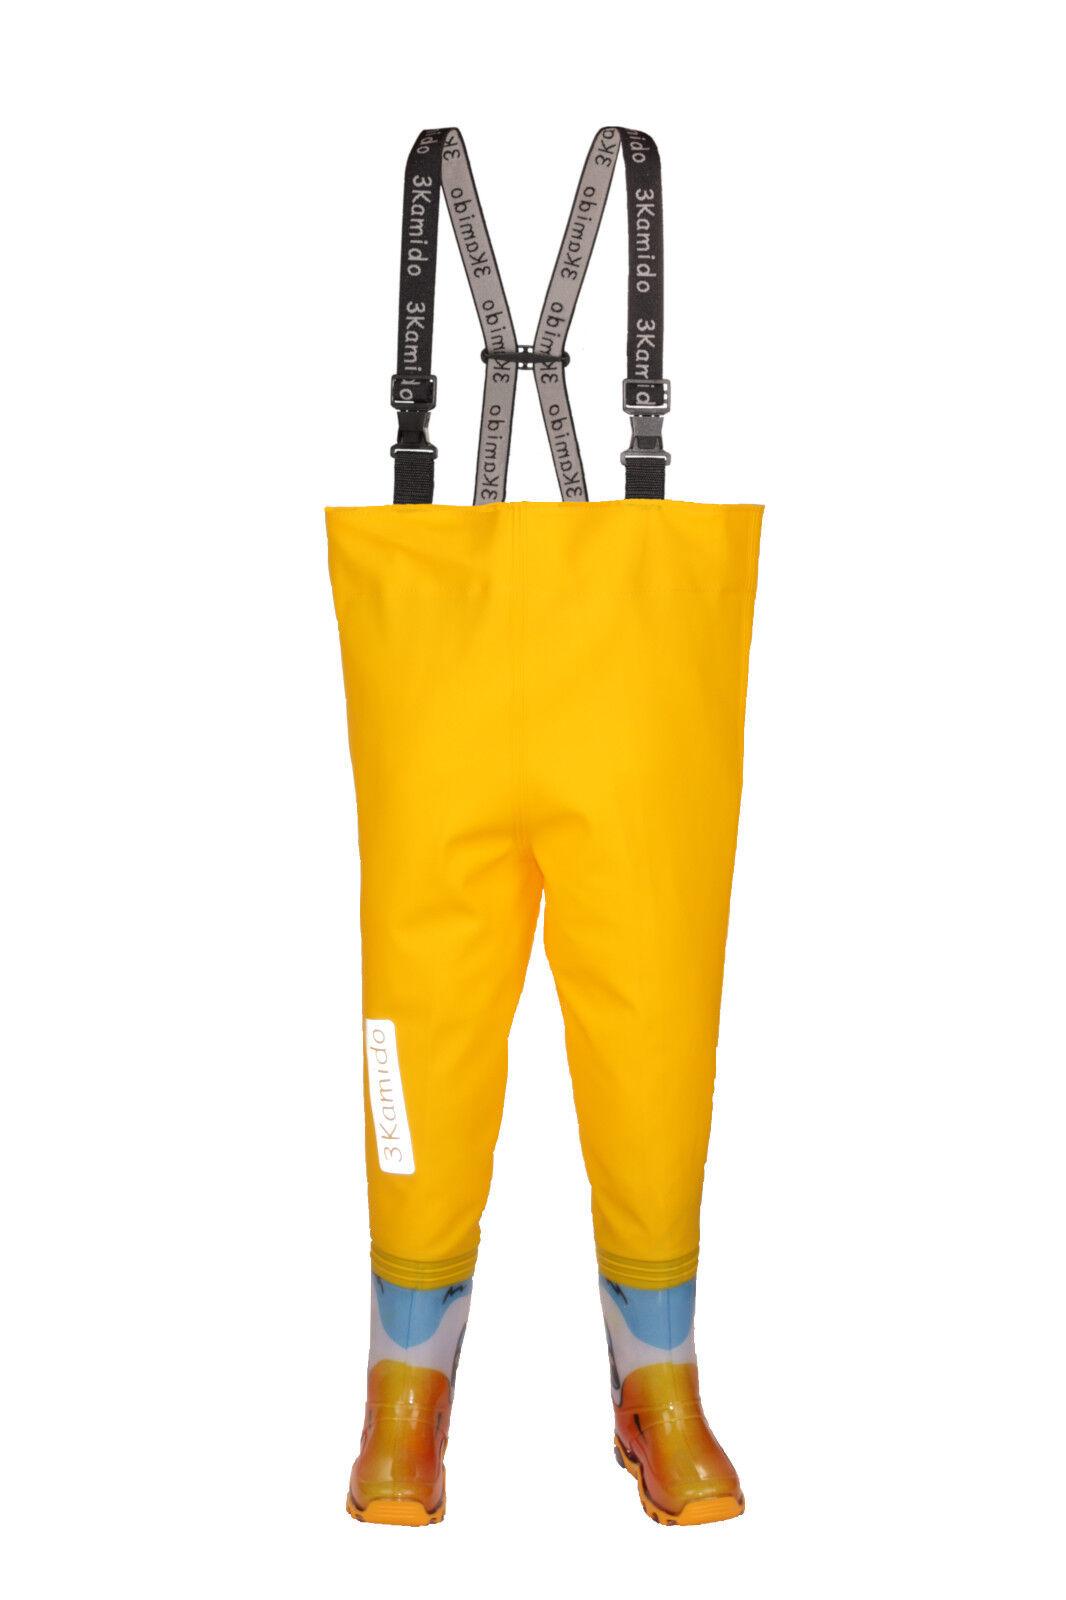 Kinderwathose  3KAMIDO PRO Kinder Wathose ENTE   yellow  Matschhose